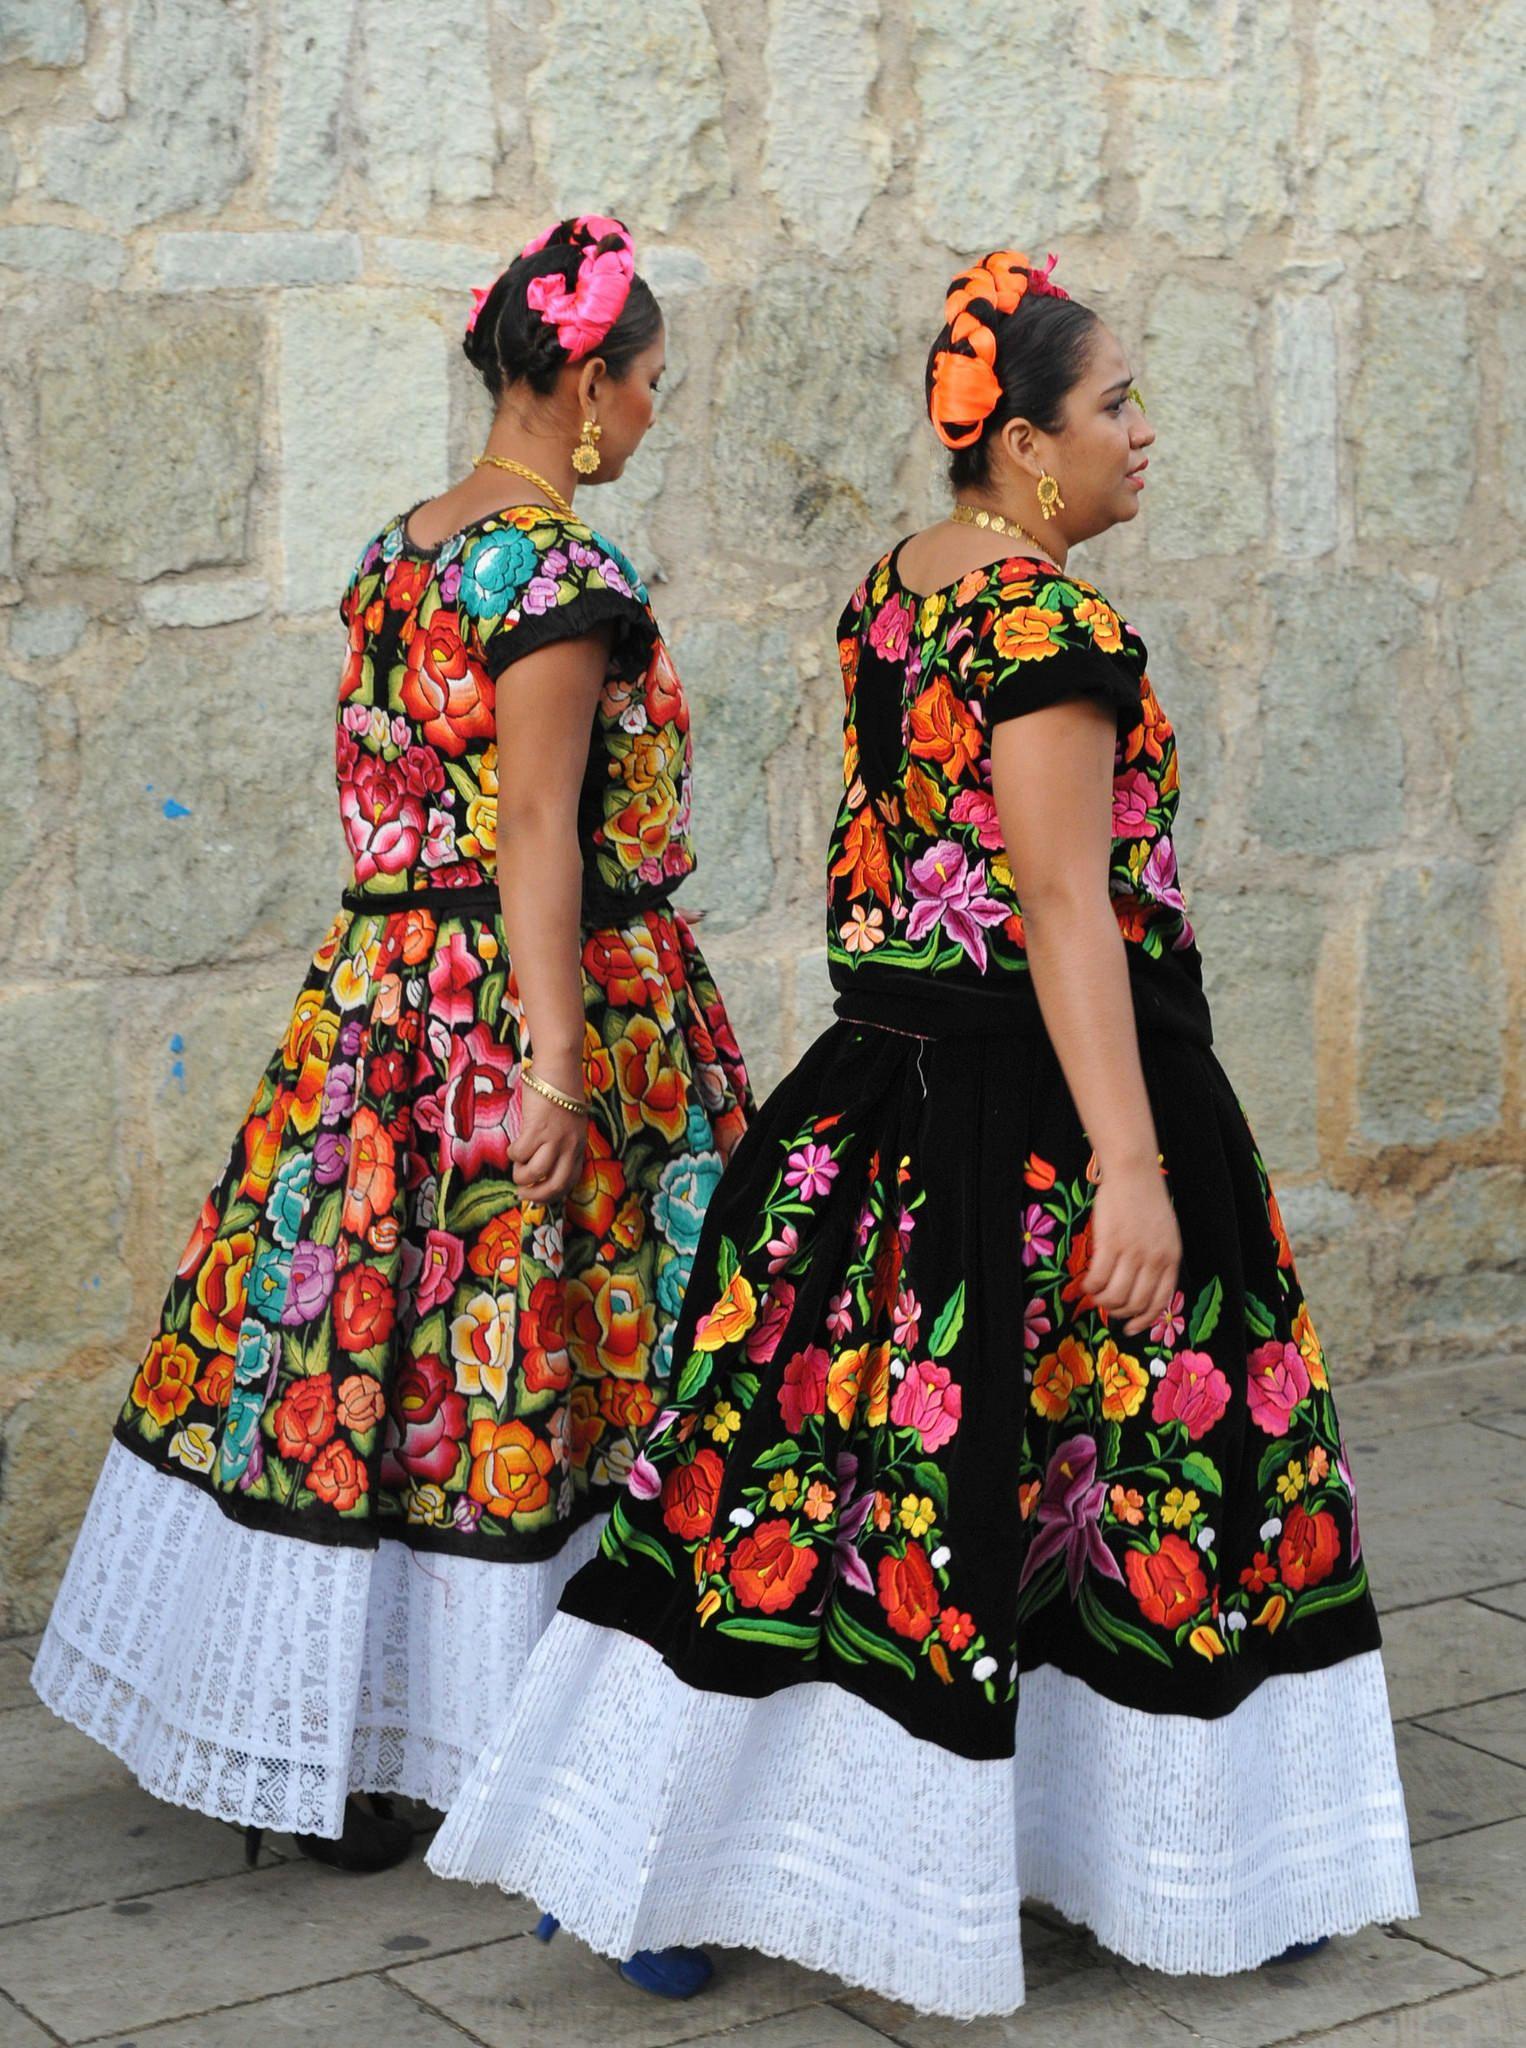 tehuana women oaxaca mexico  mexican outfit mexican